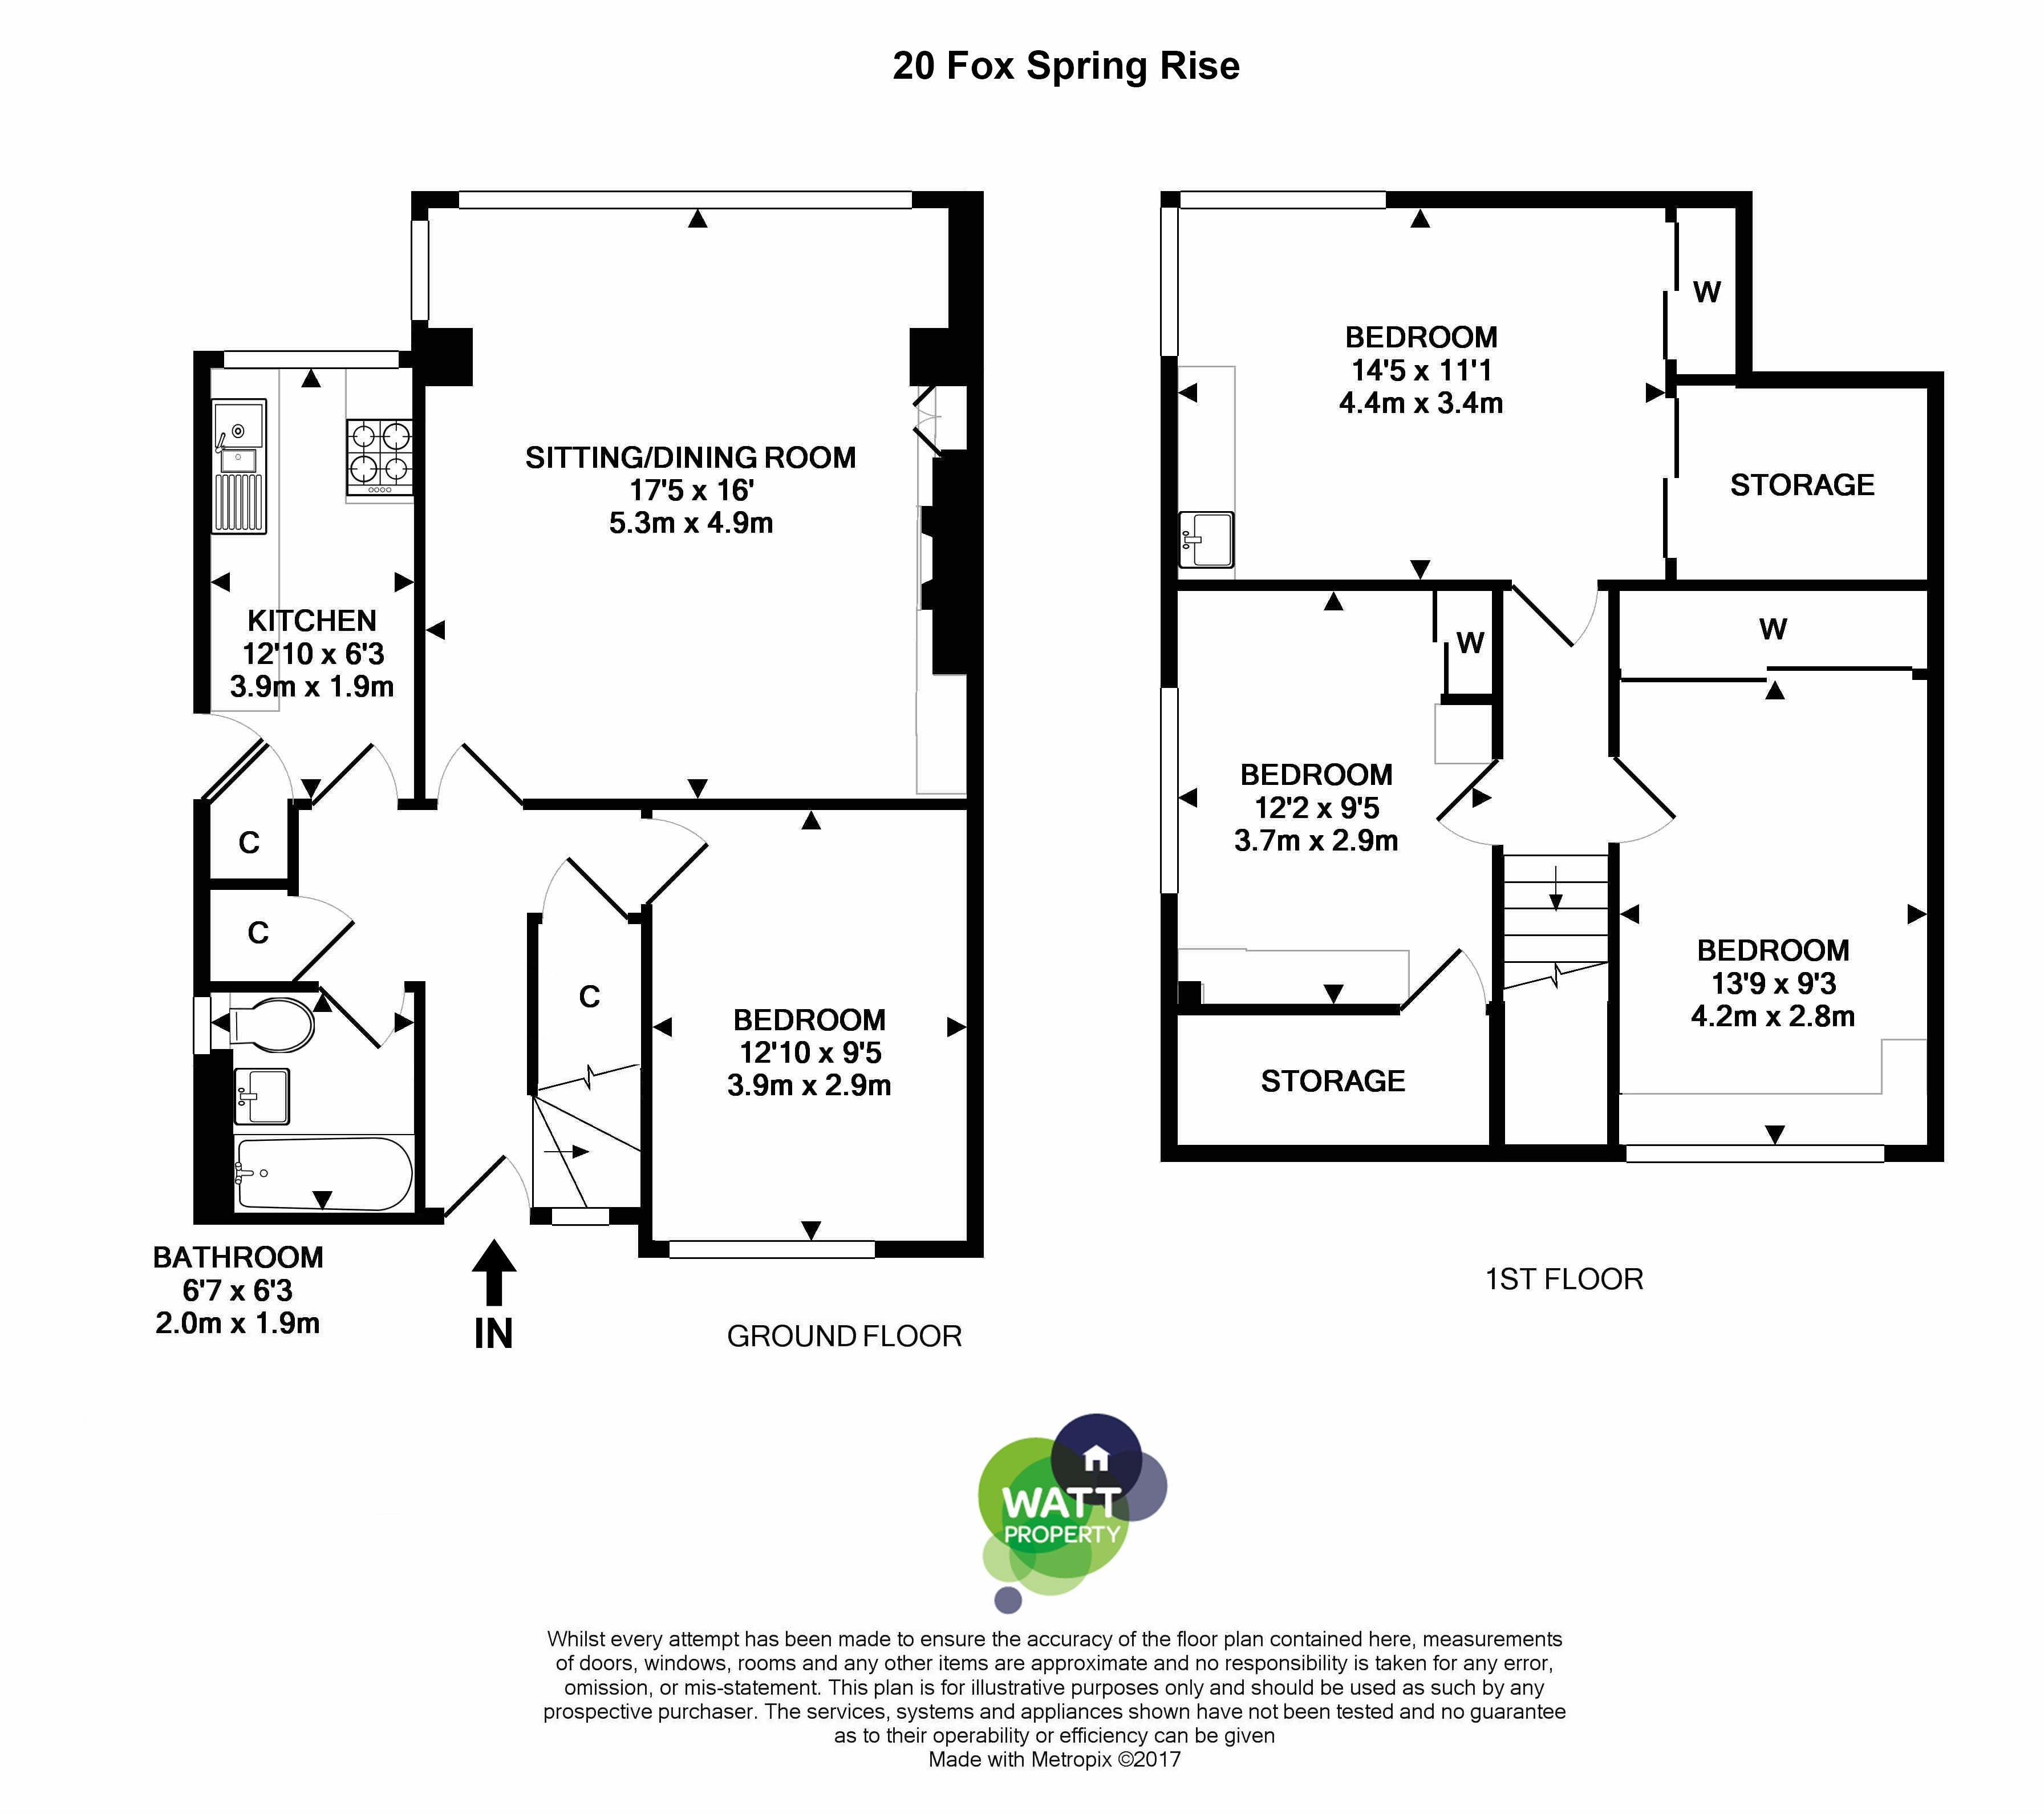 20 Fox Spring Rise Fairmilehead Eh10 6ne Watt Property Edinburgh Schematic Downloads Pdf